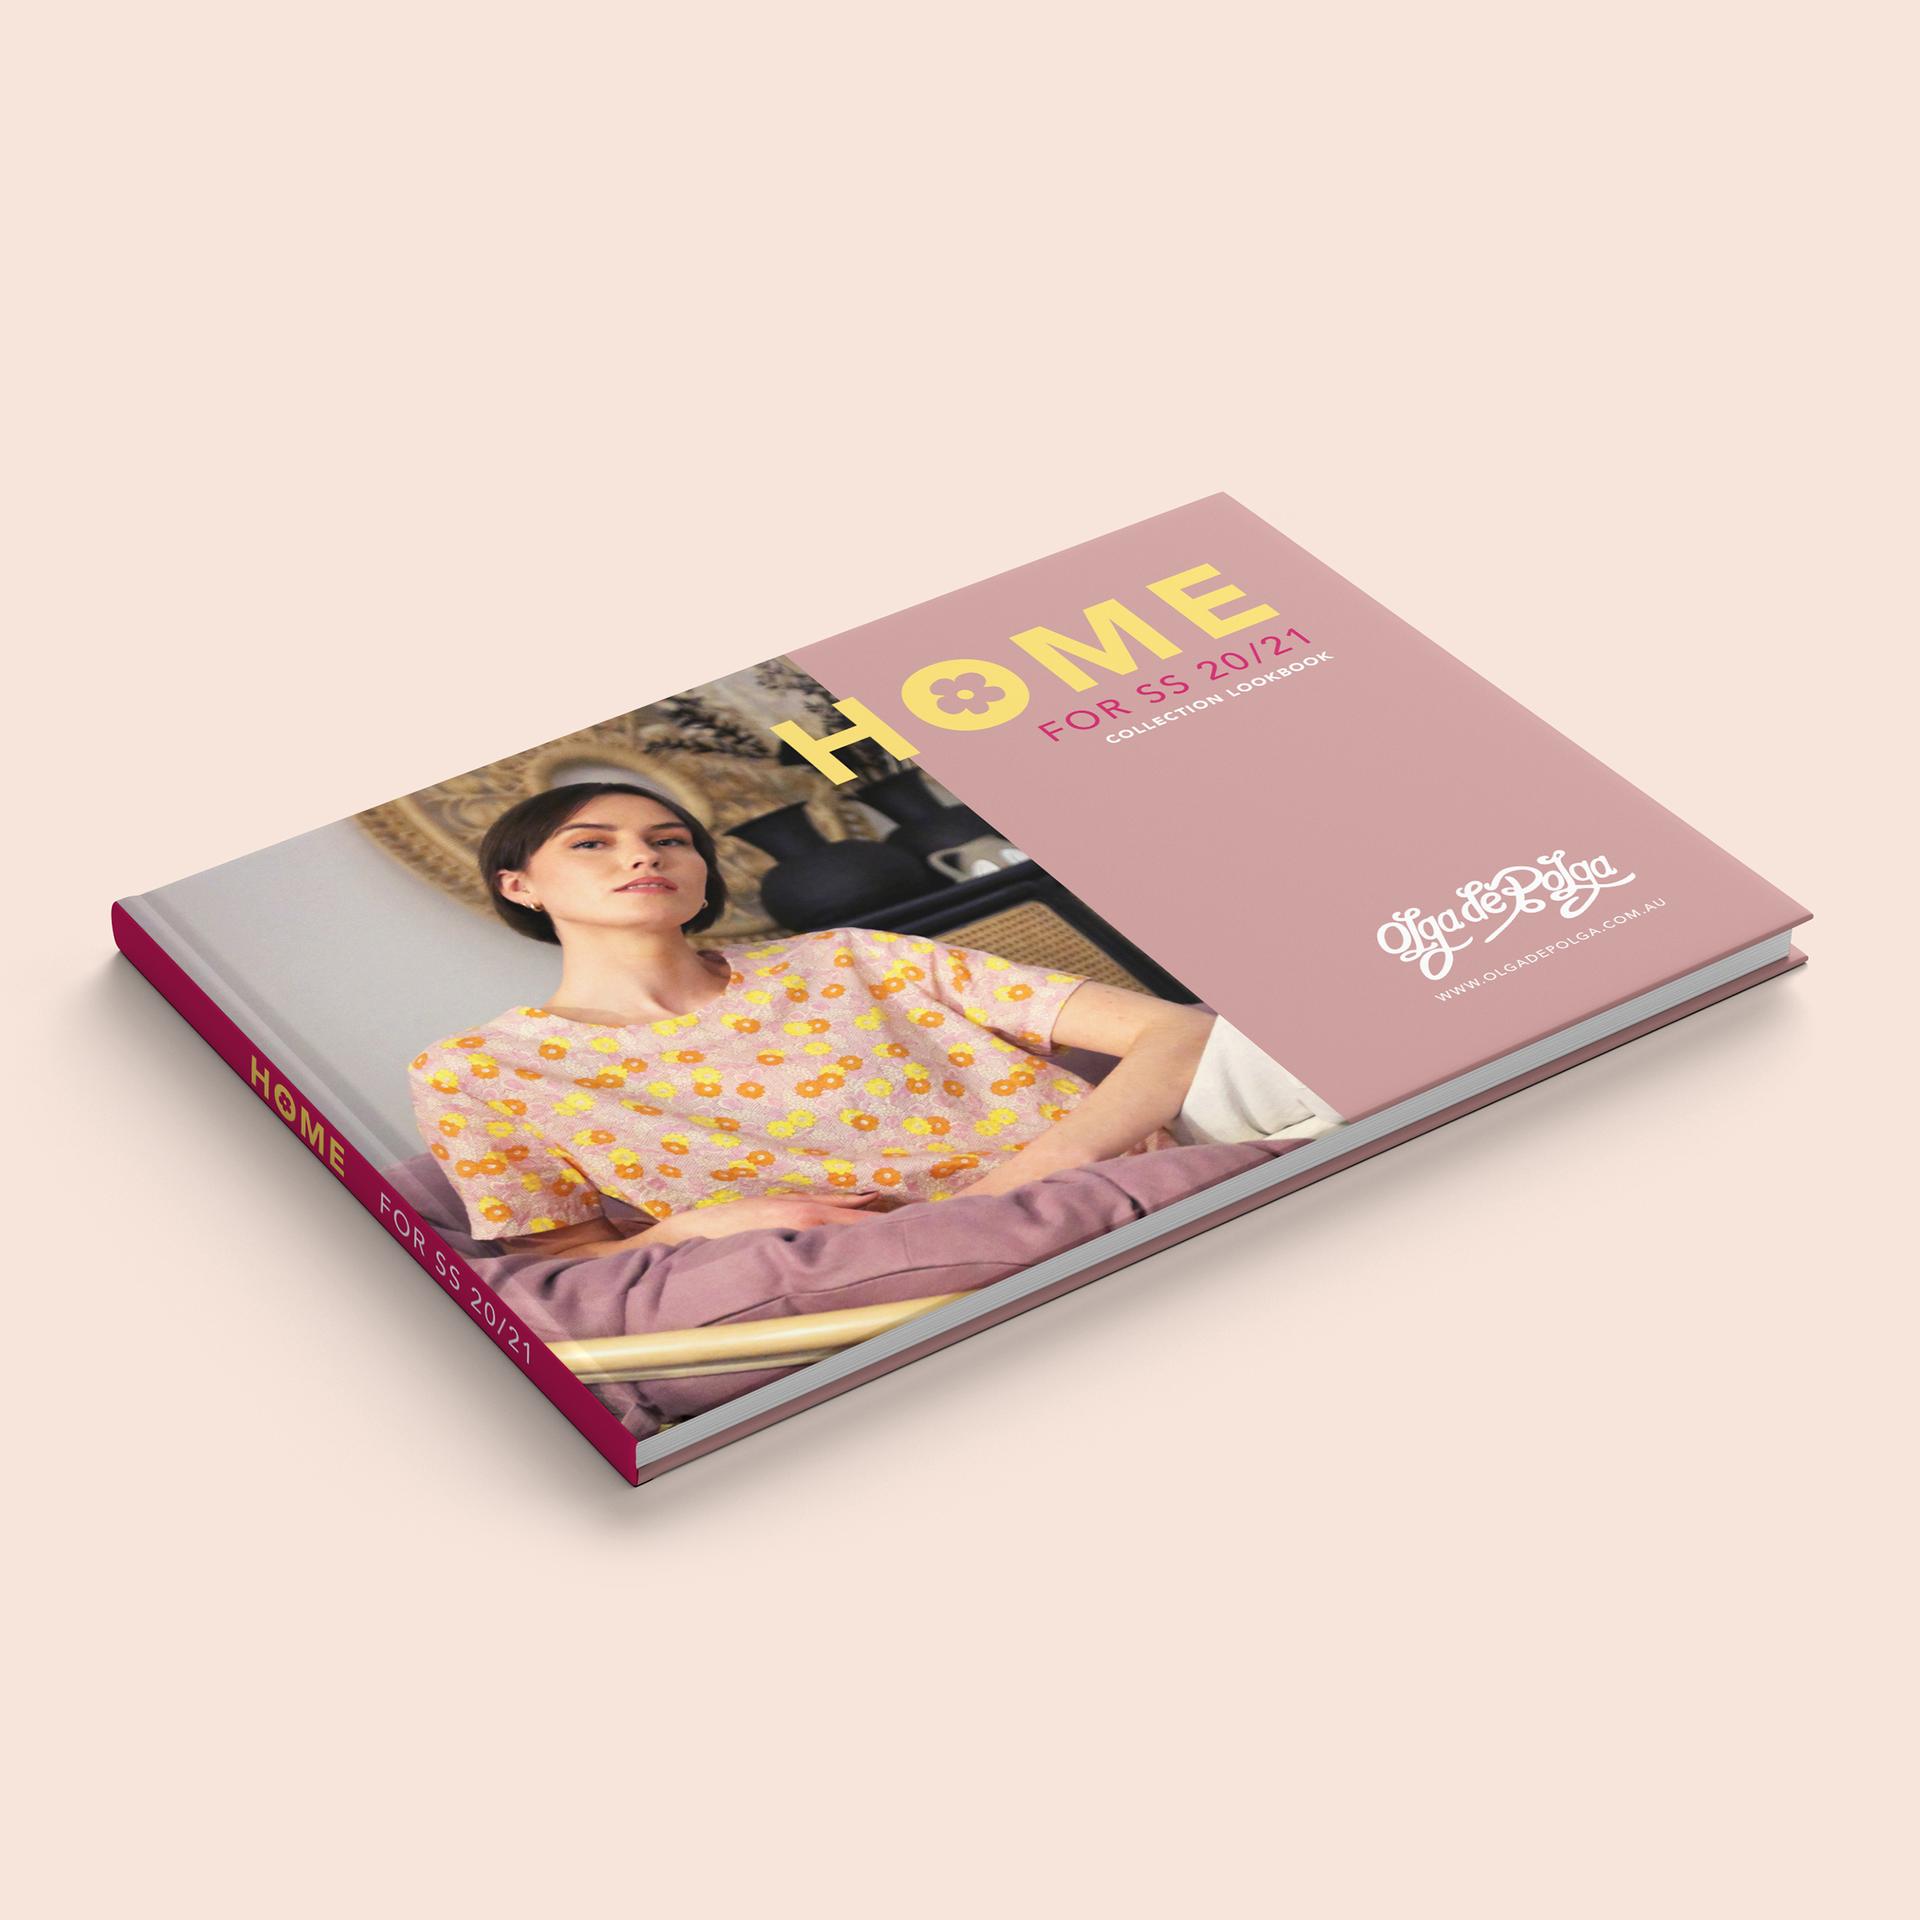 Olga de Polga Lookbook Graphic Design & Photography Editing